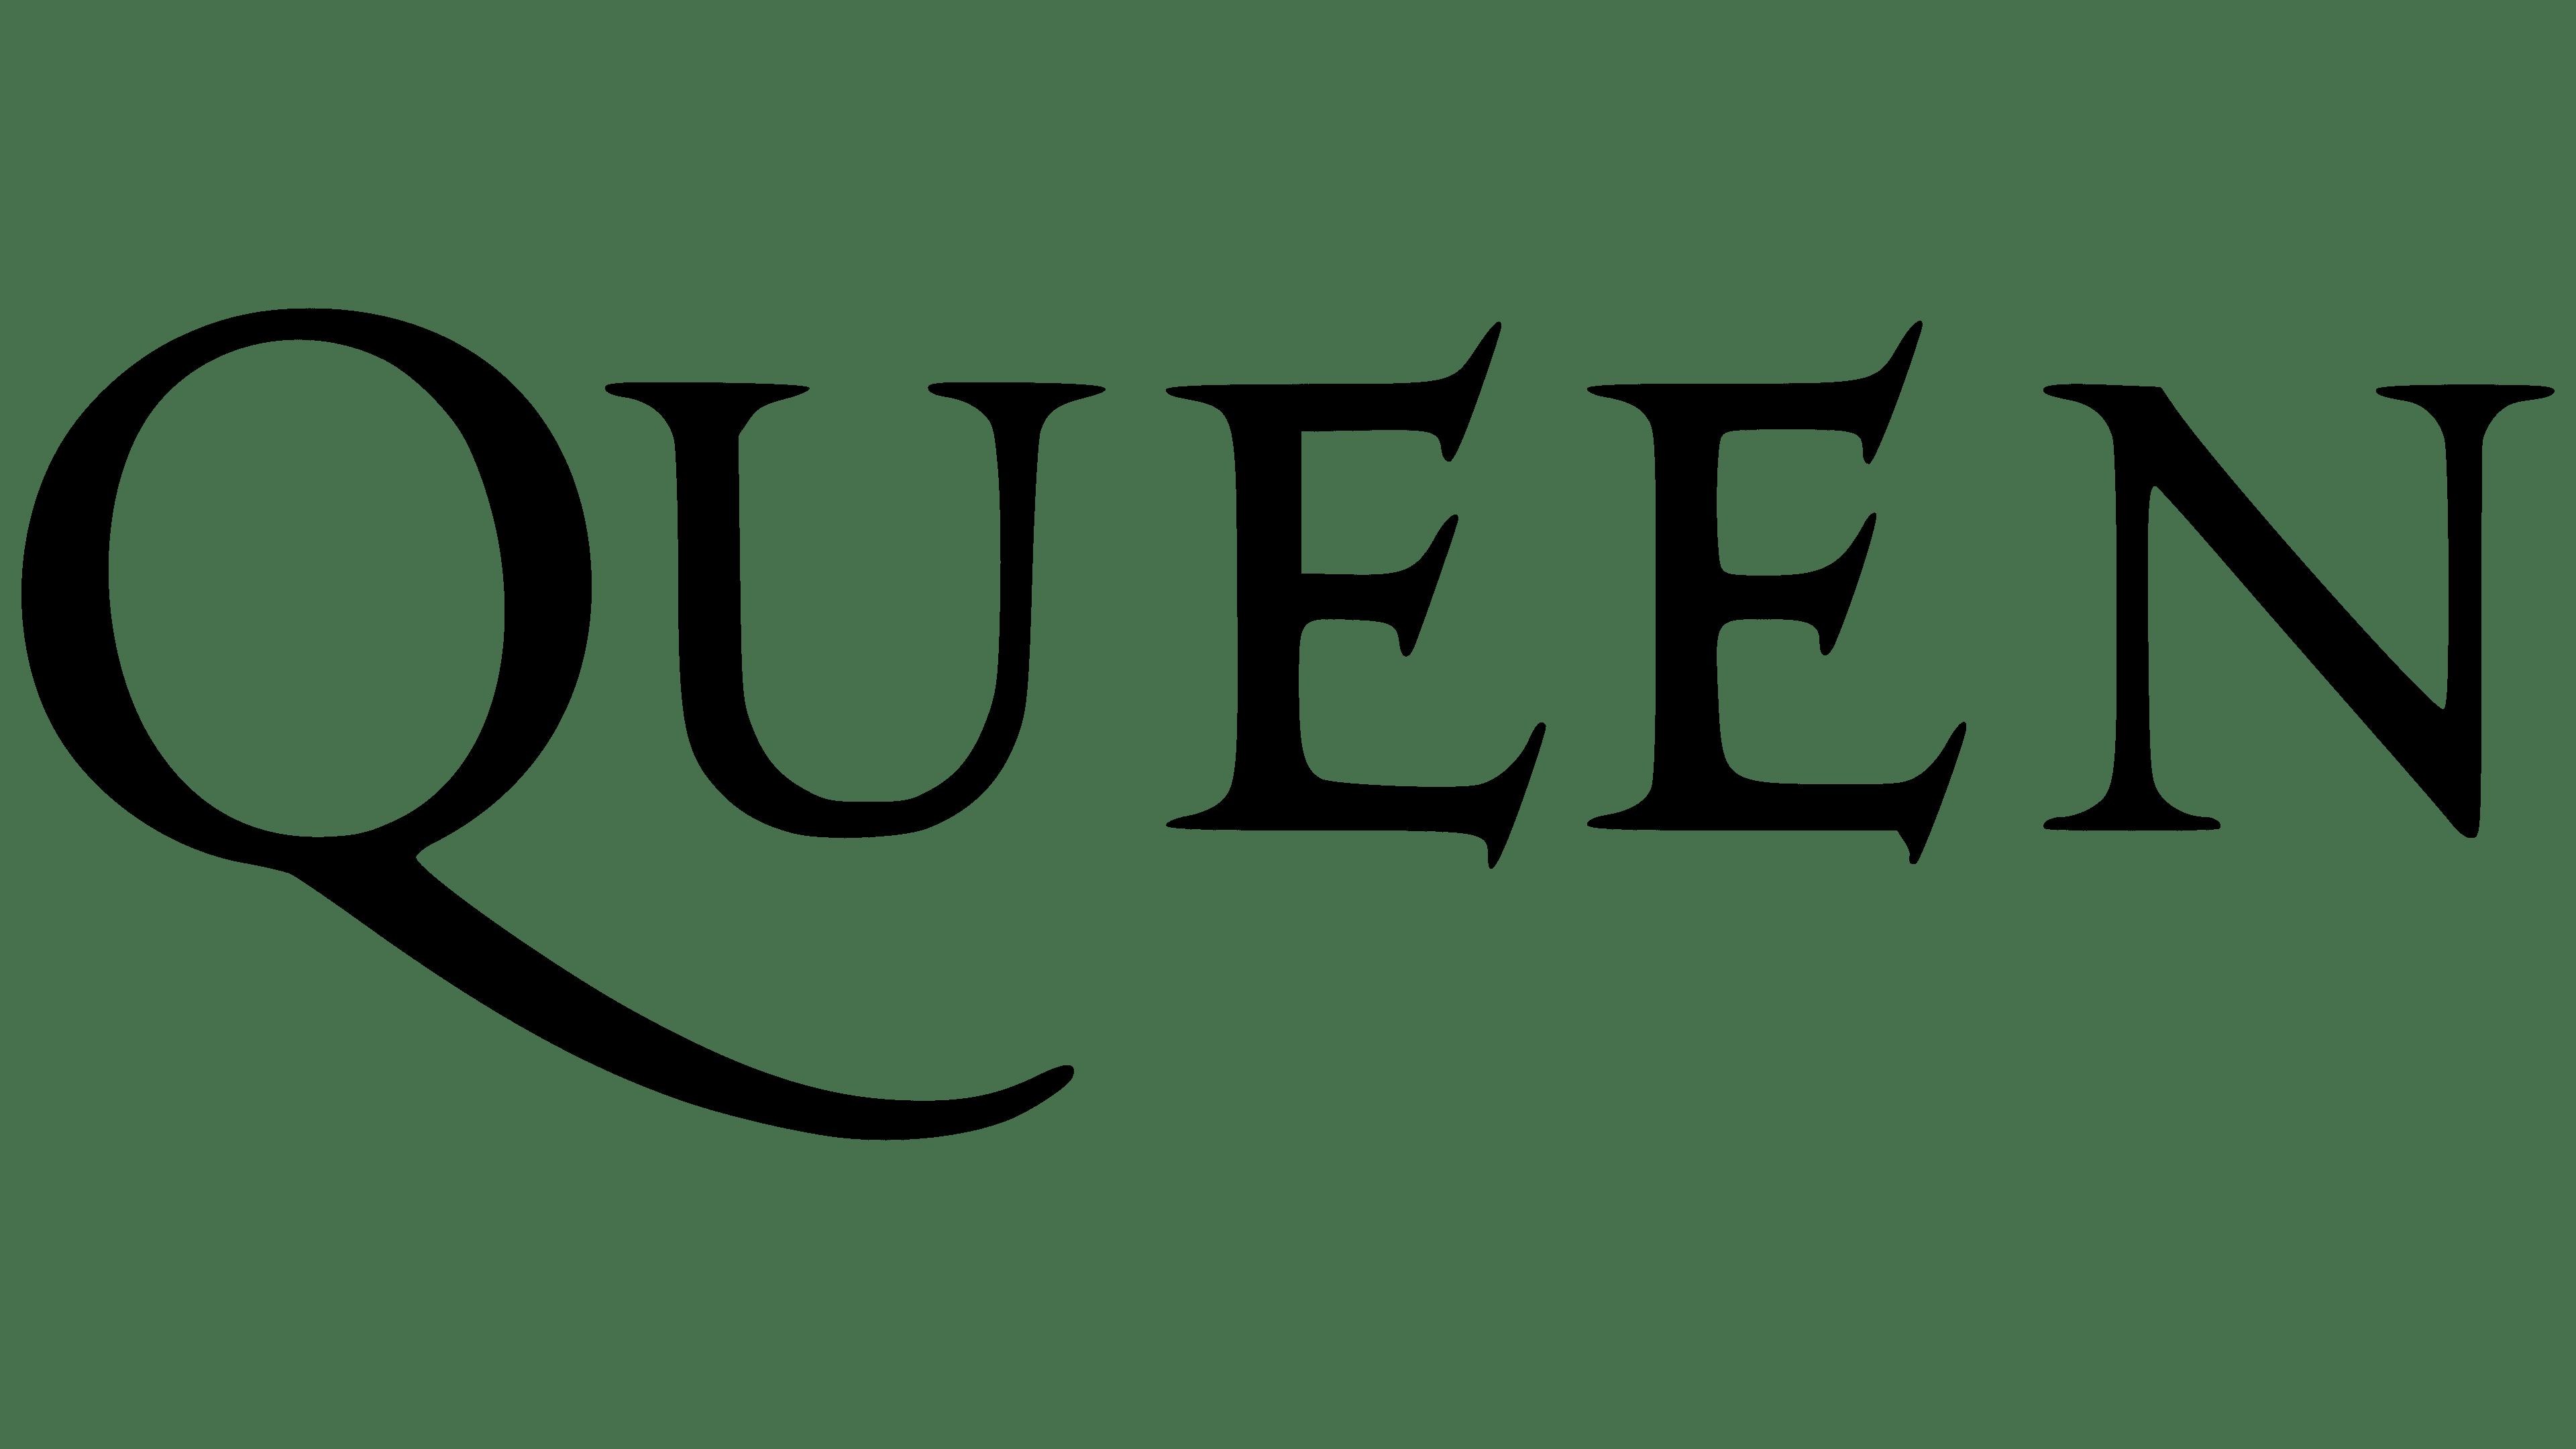 Queen symbol